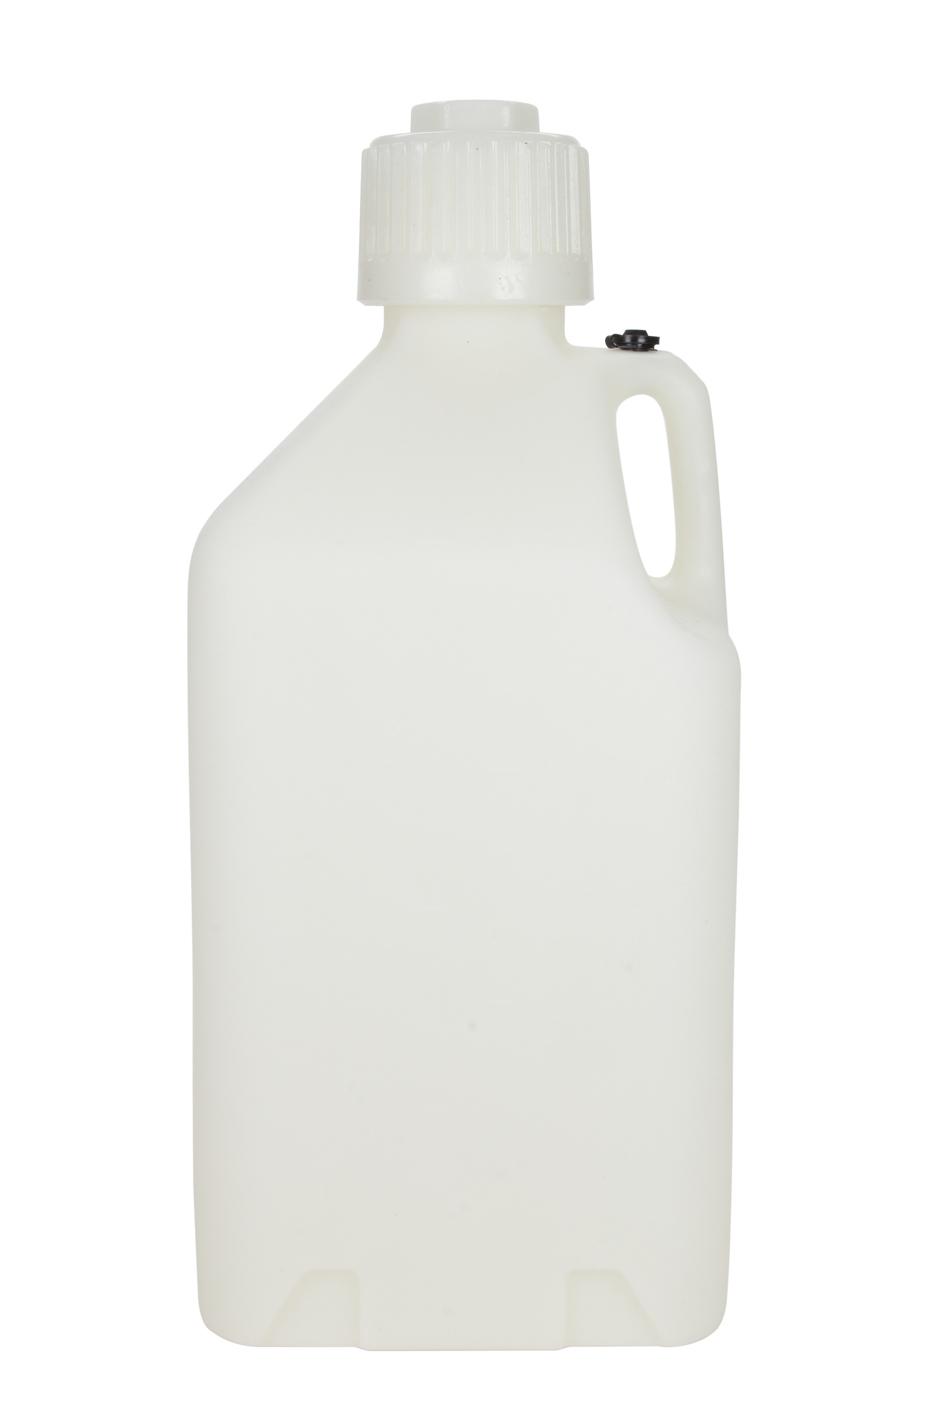 Utility Jug - 5-Gallon Clear